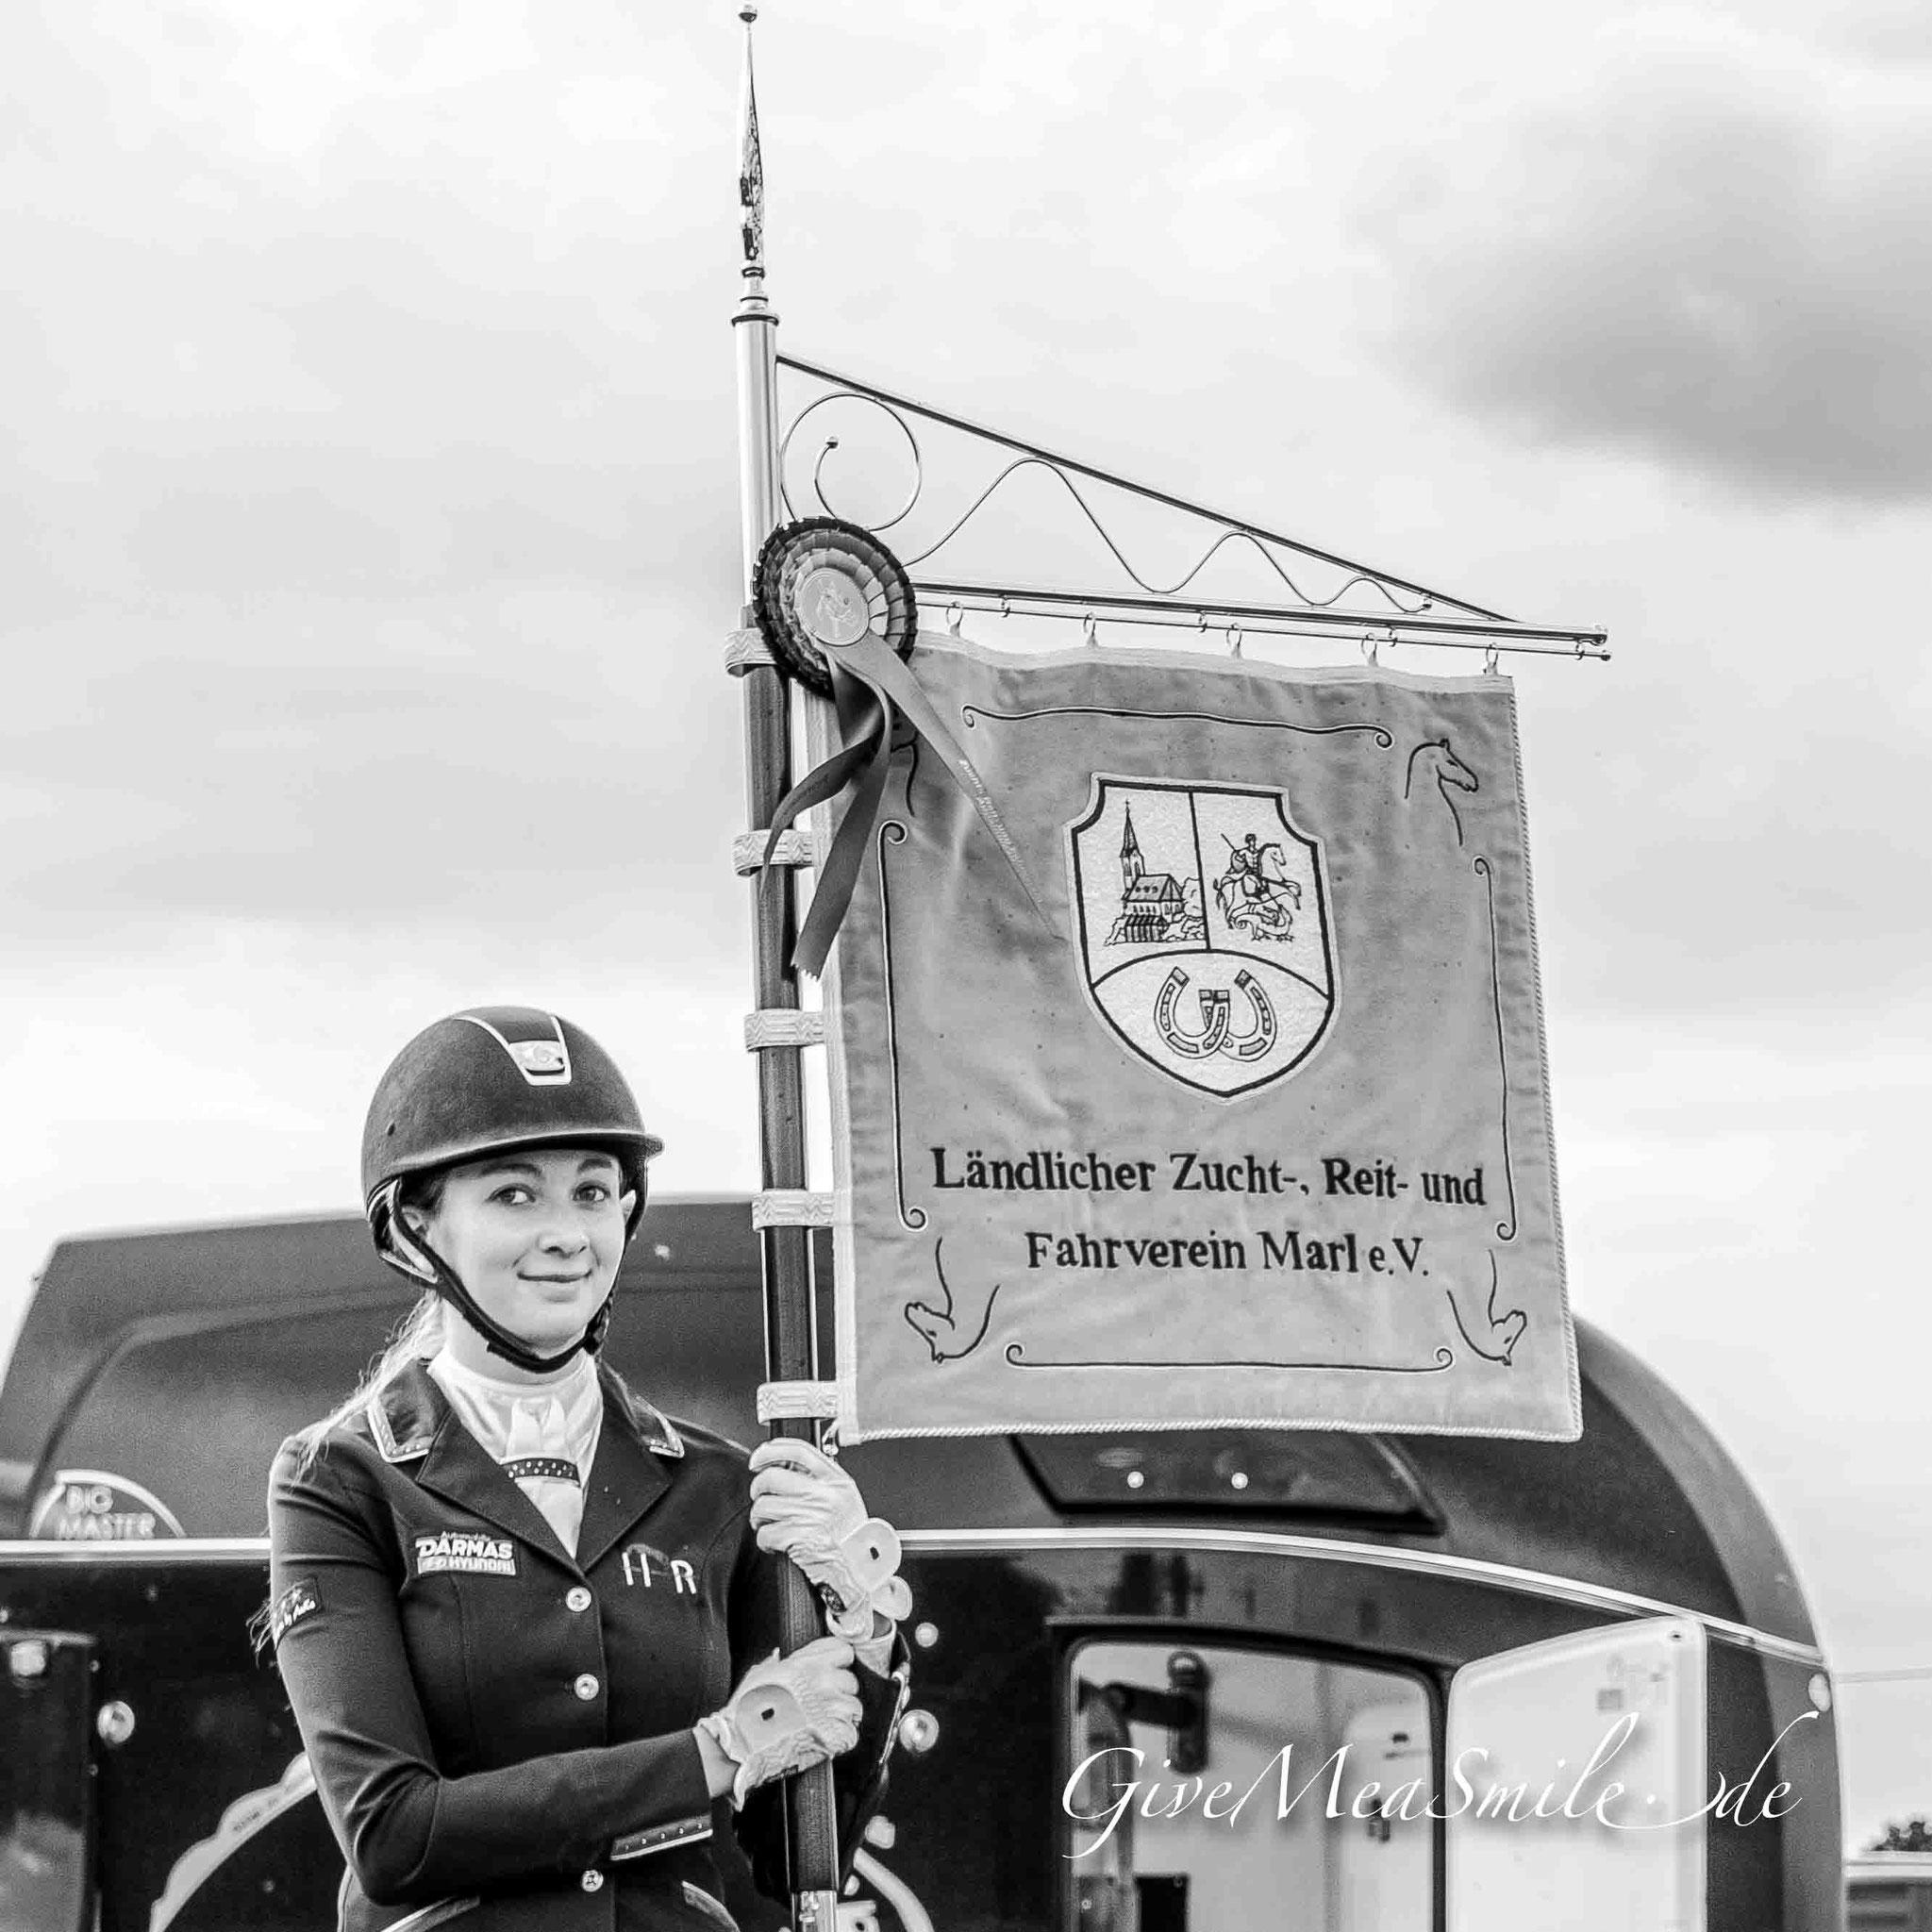 Jagdfotos vom Team @Givemeasmile.de auf der Fotojagd, Peter Jäger   #hofthier #givemeasmilede #beaglemeutemünsterland #foxhounds #beagles #jagdreiten #schleppjagd